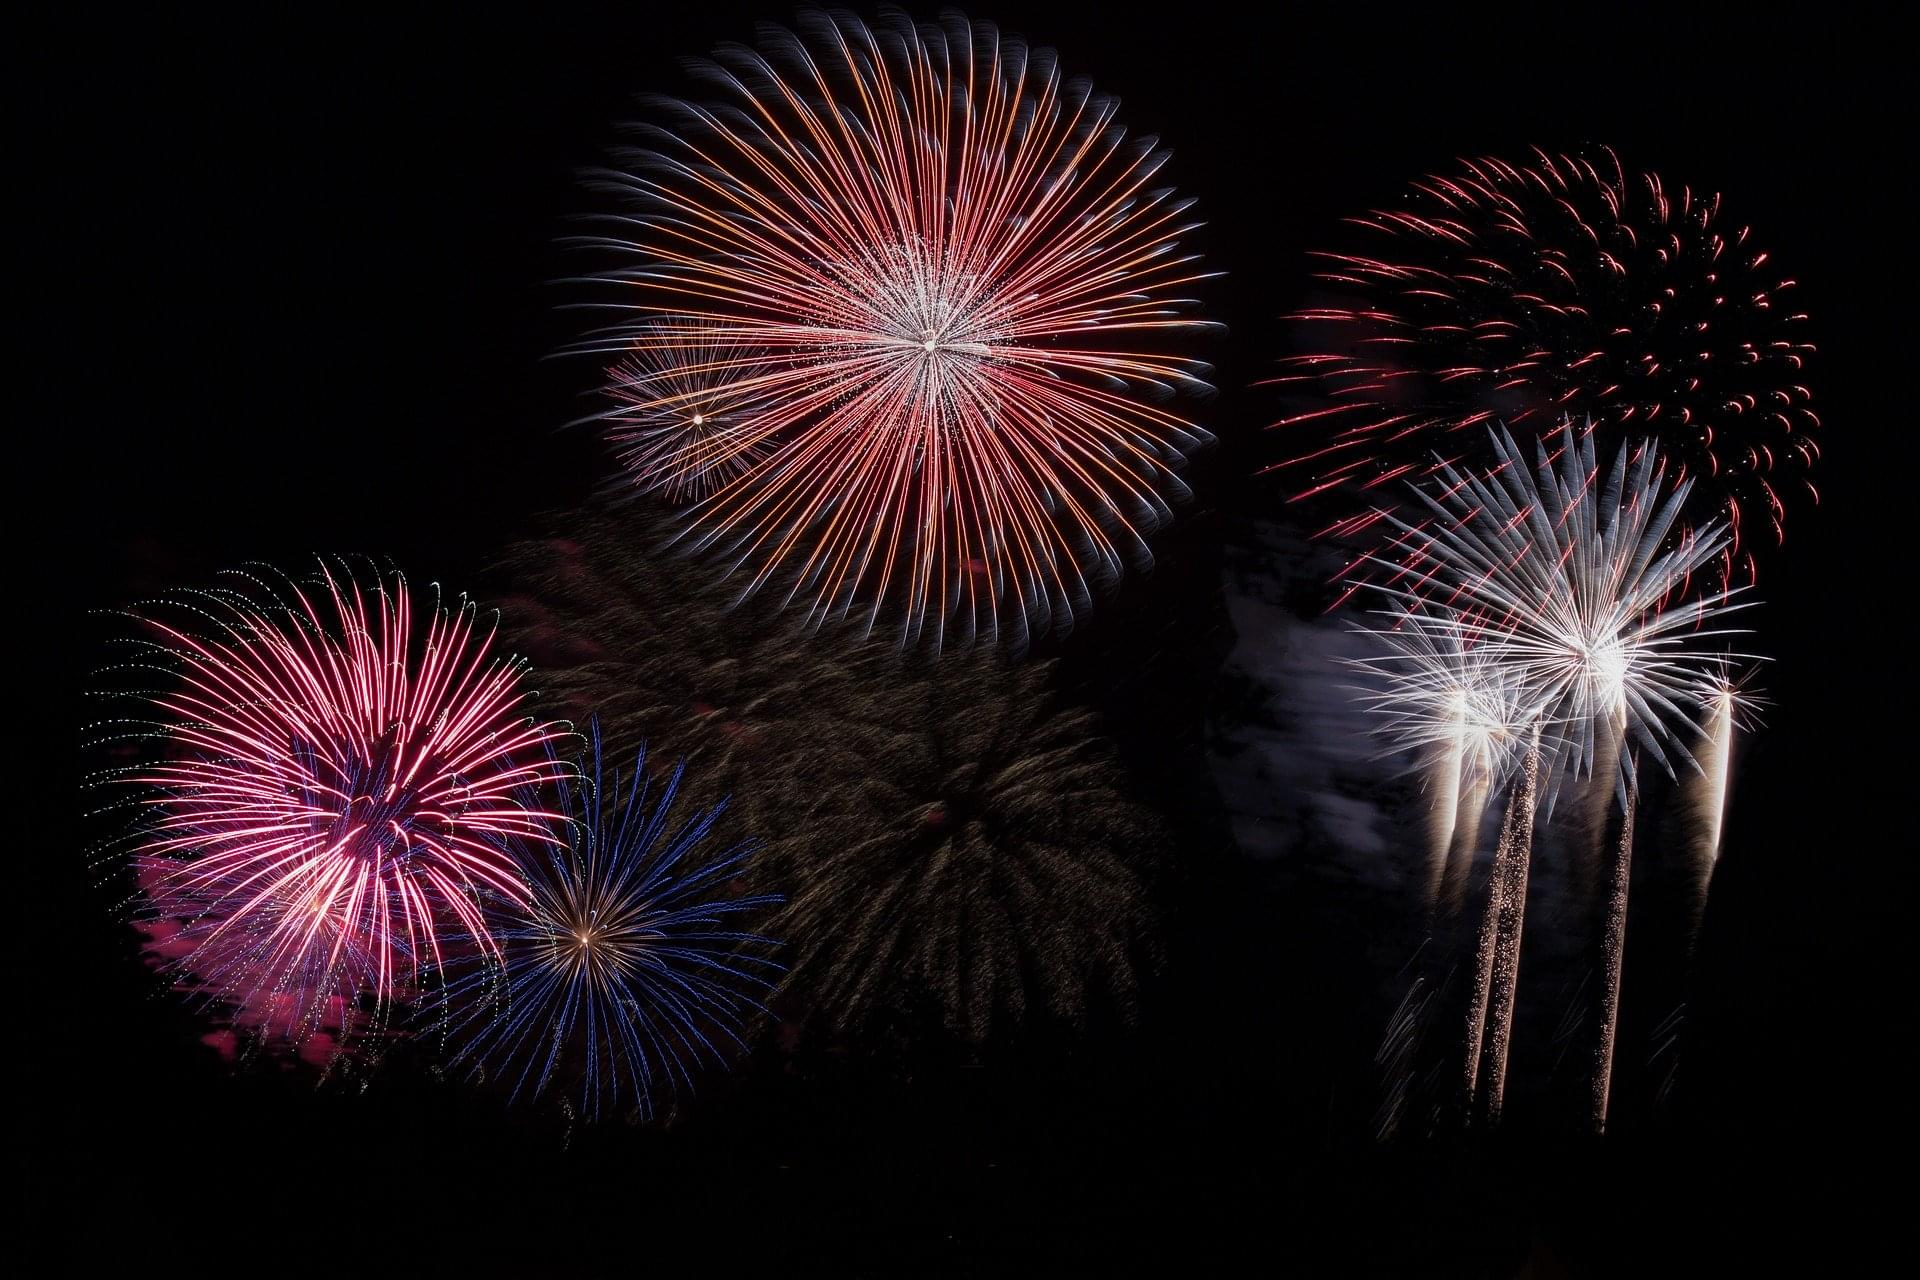 Colorado Detonated The World's Largest Firework